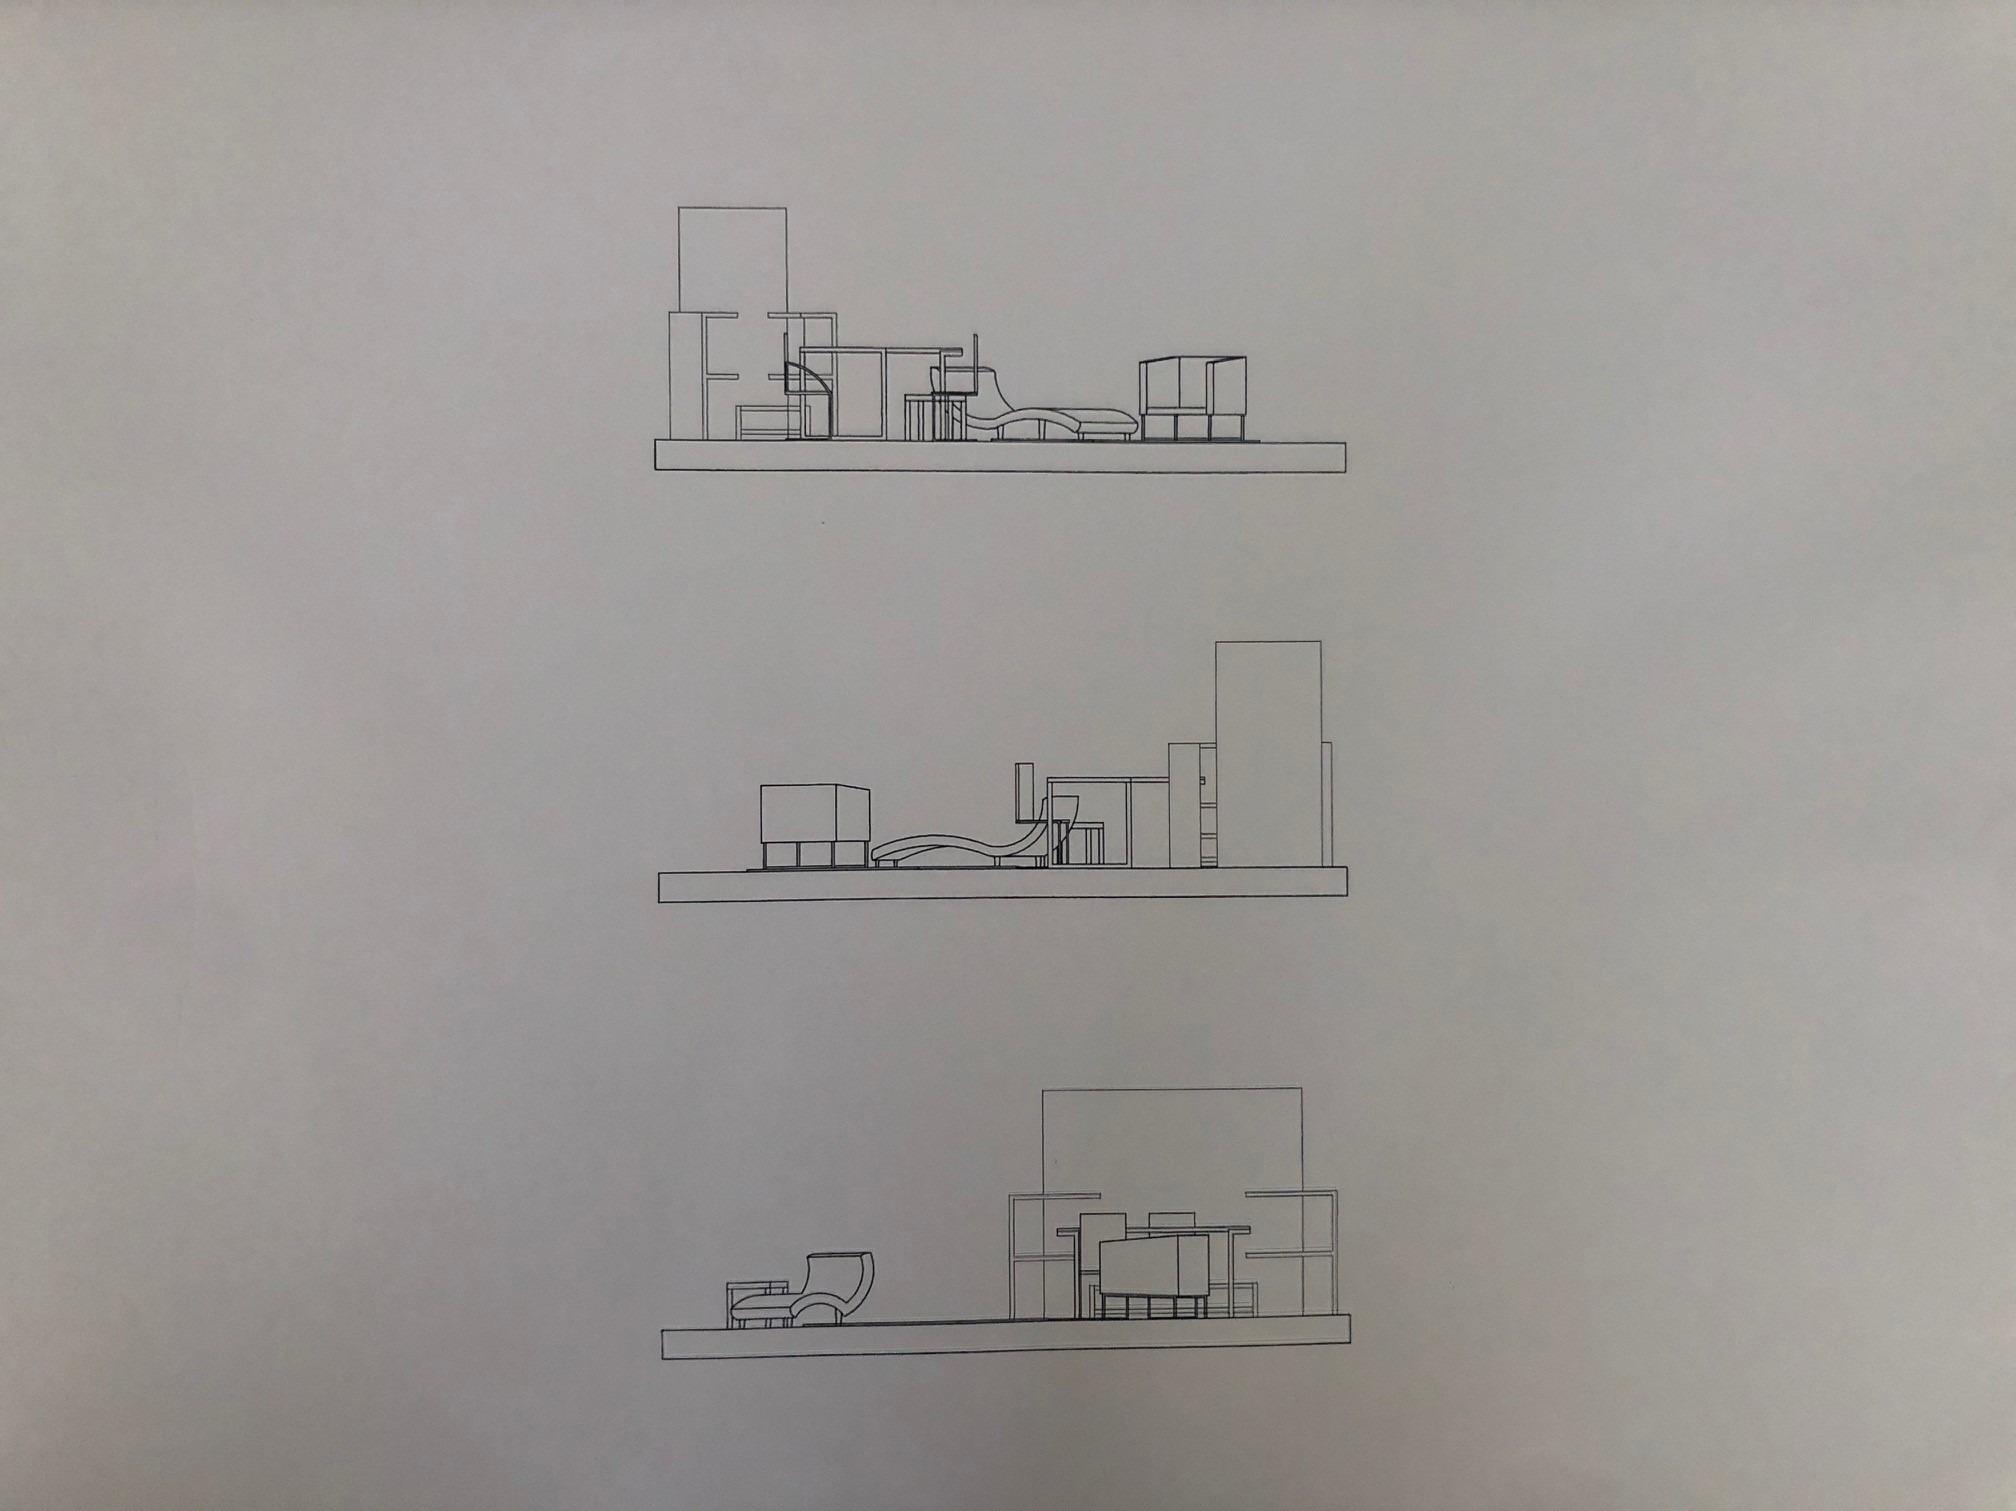 "<span  class=""uc_style_uc_tiles_grid_image_elementor_uc_items_attribute_title"" style=""color:#ffffff;"">Ana Paula Rocha - Teatro - Vermelho Transparente - Outubro 2006 - 005</span>"